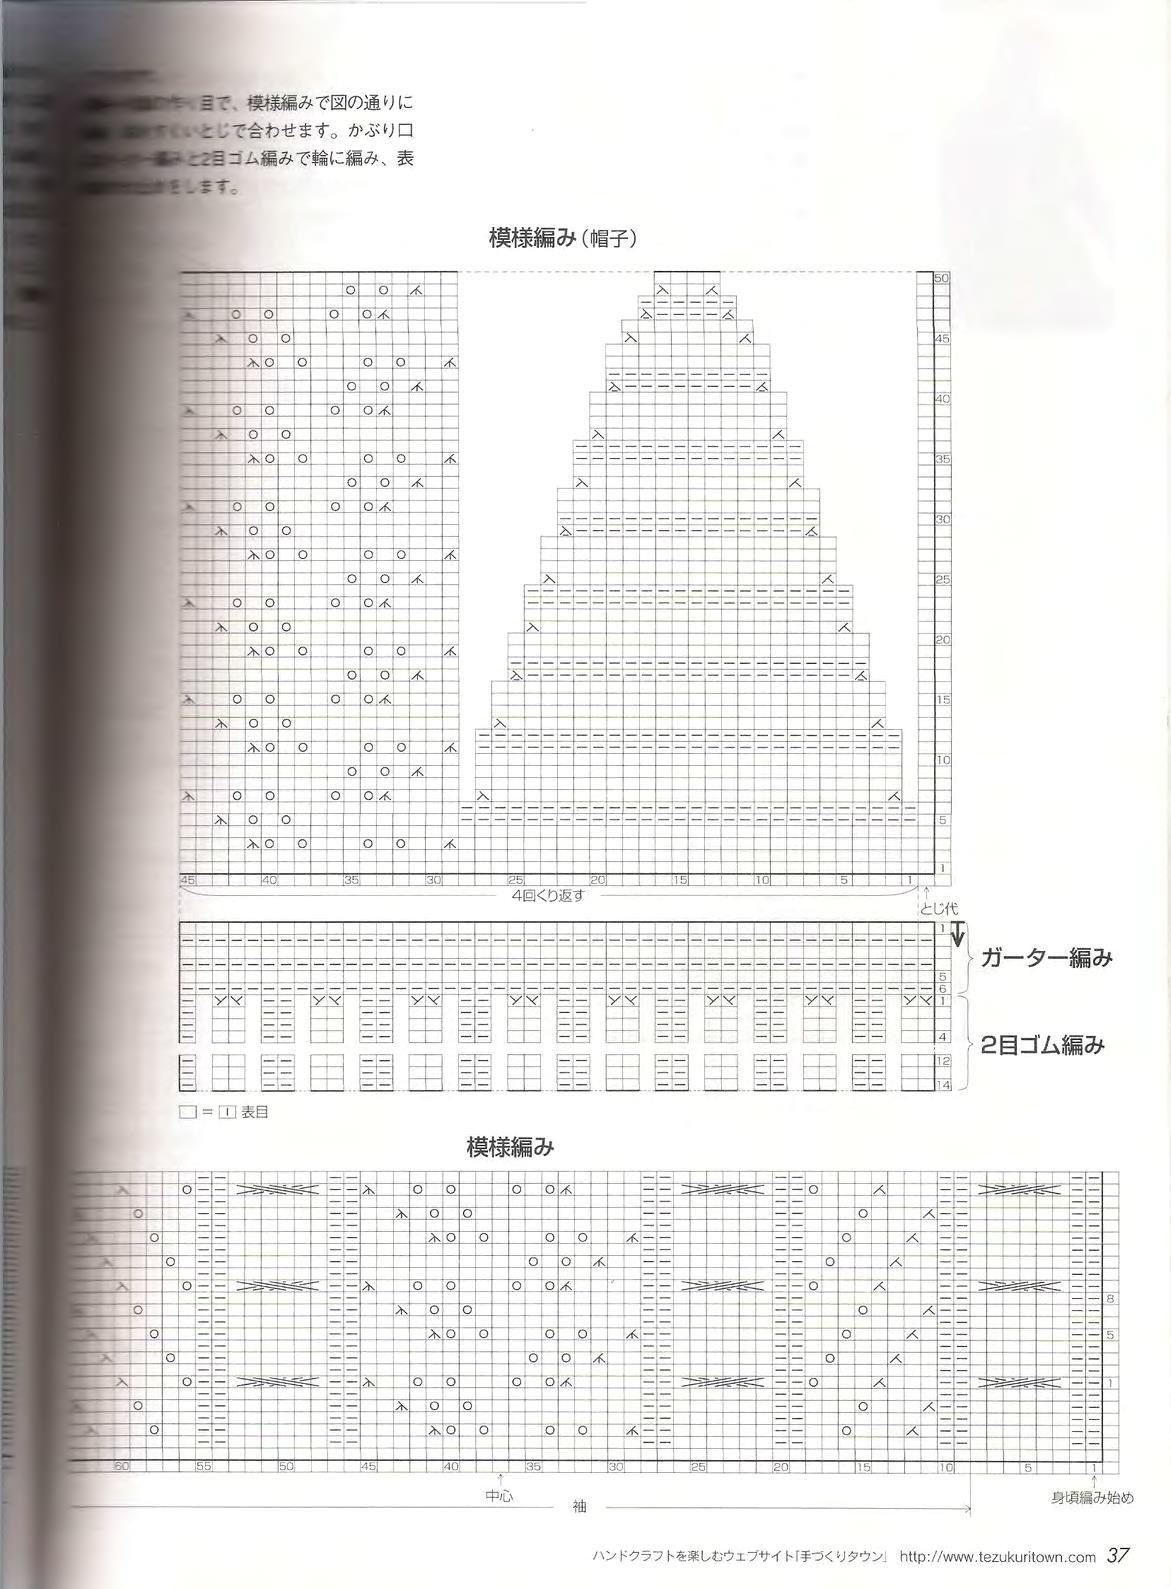 Let's knit series NV4375 2008 M-L sp-kr_37